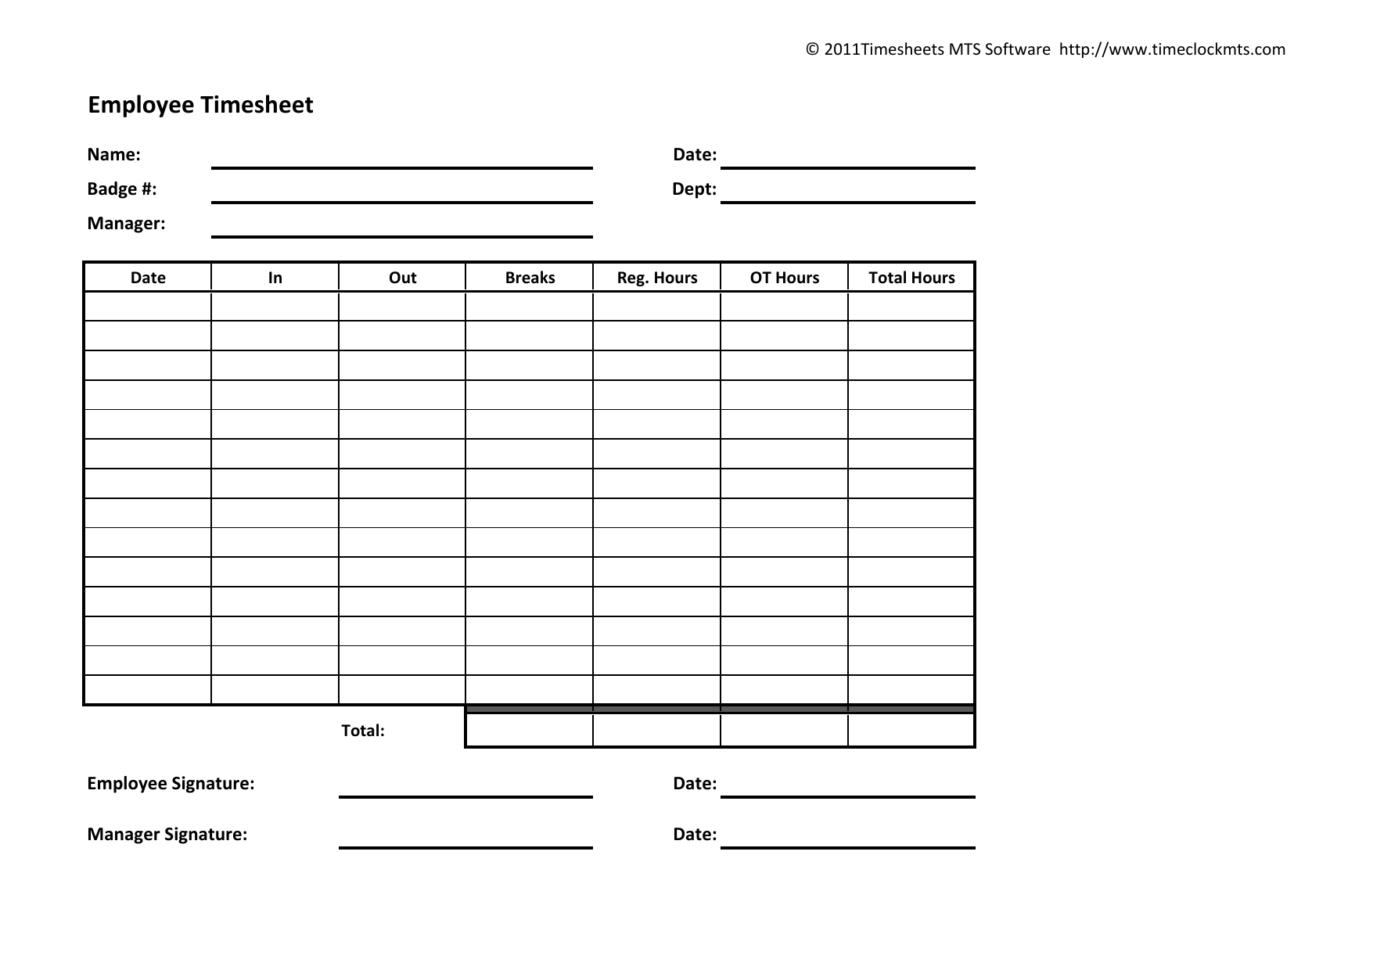 Weekly Timesheet Spreadsheet Throughout Download Weekly Timesheet Template  Excel  Pdf  Rtf  Word